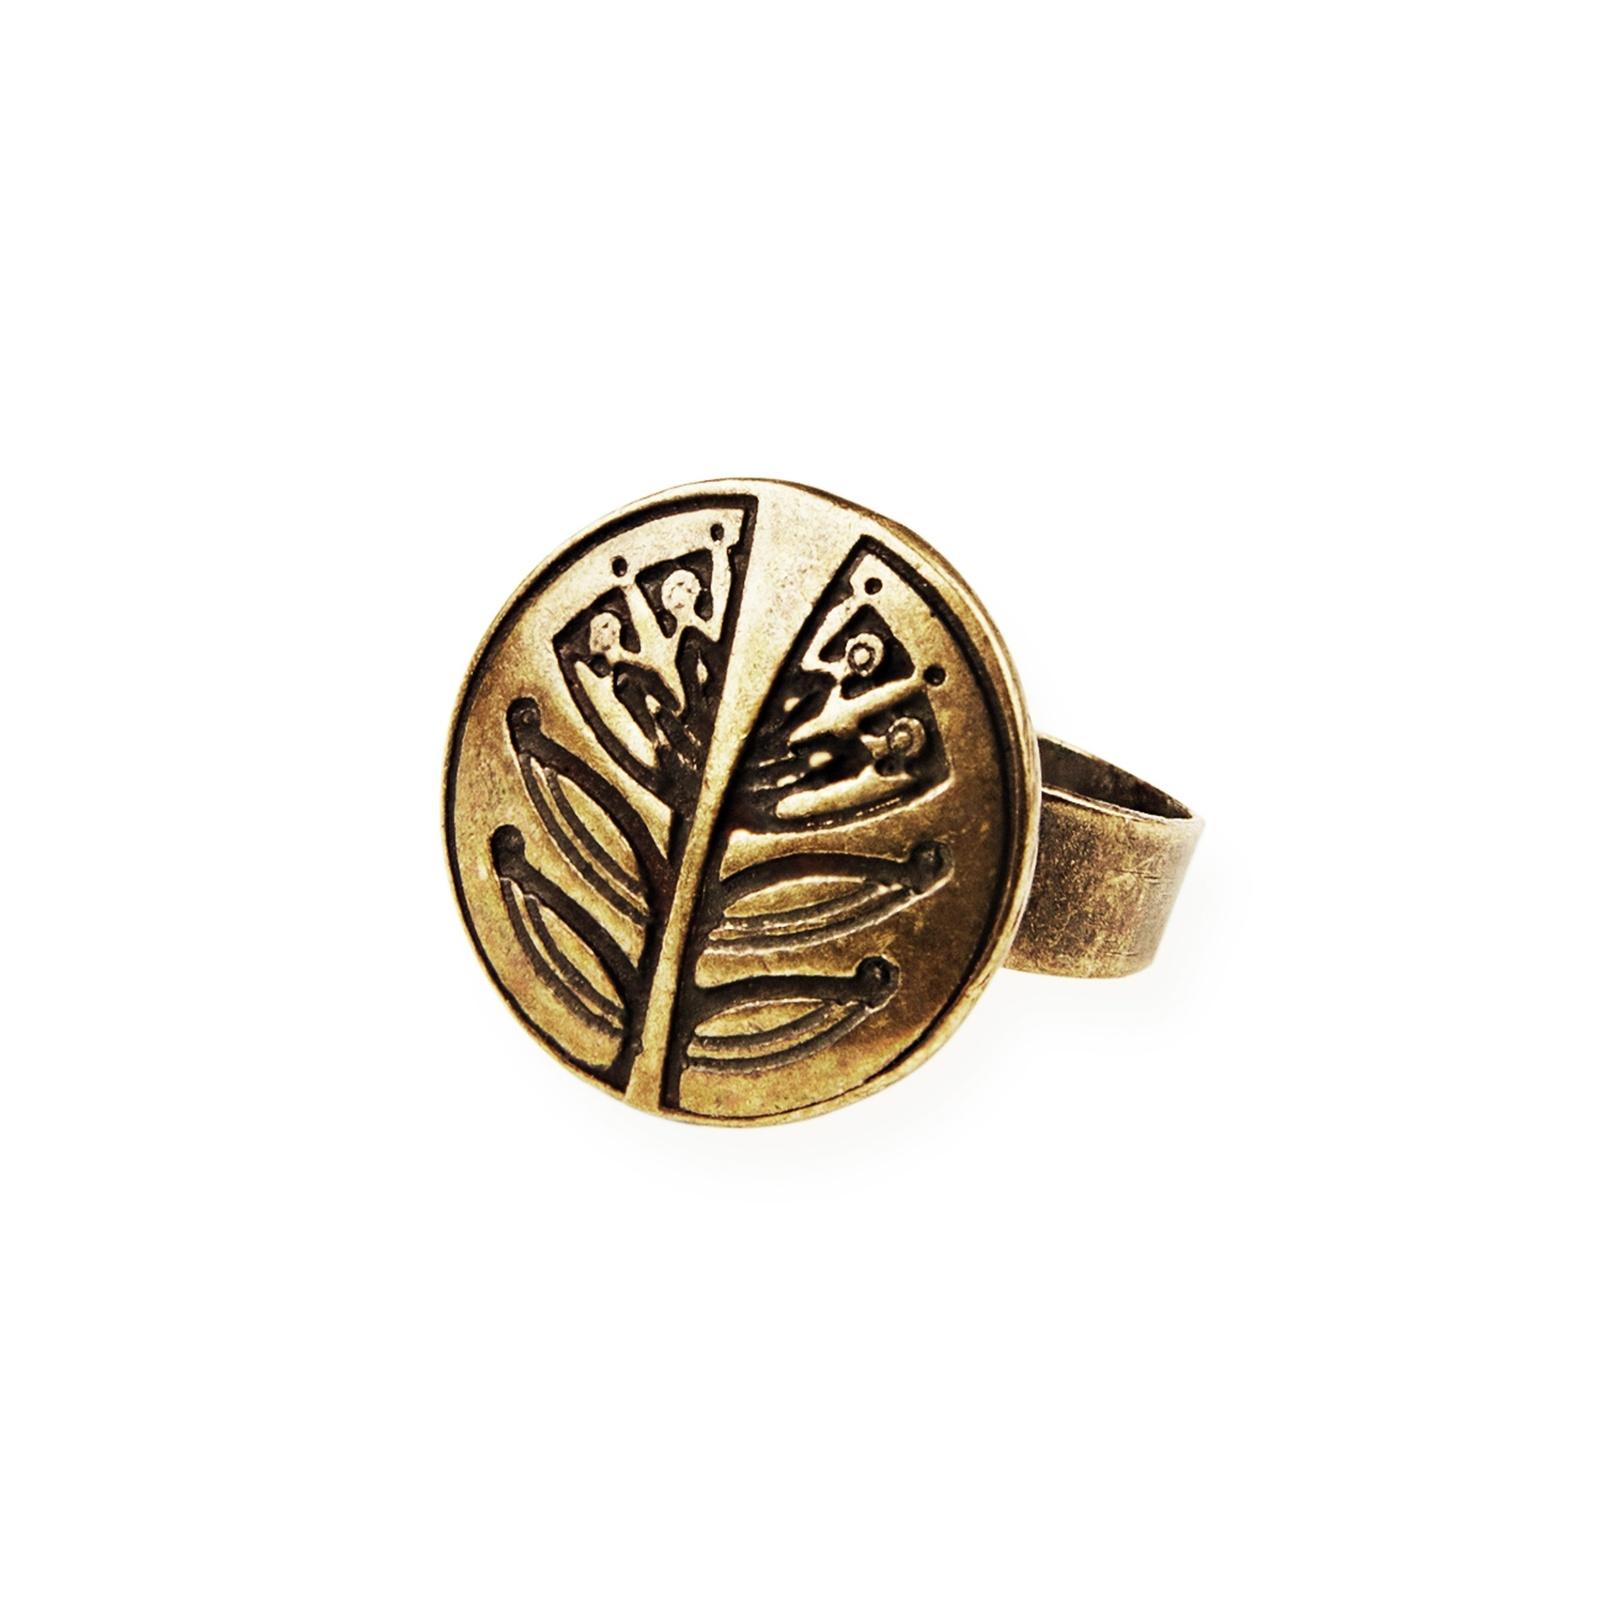 Кольцо Skifska Etnika Заграва, 115028115-8, бронза115028115-8#REF!